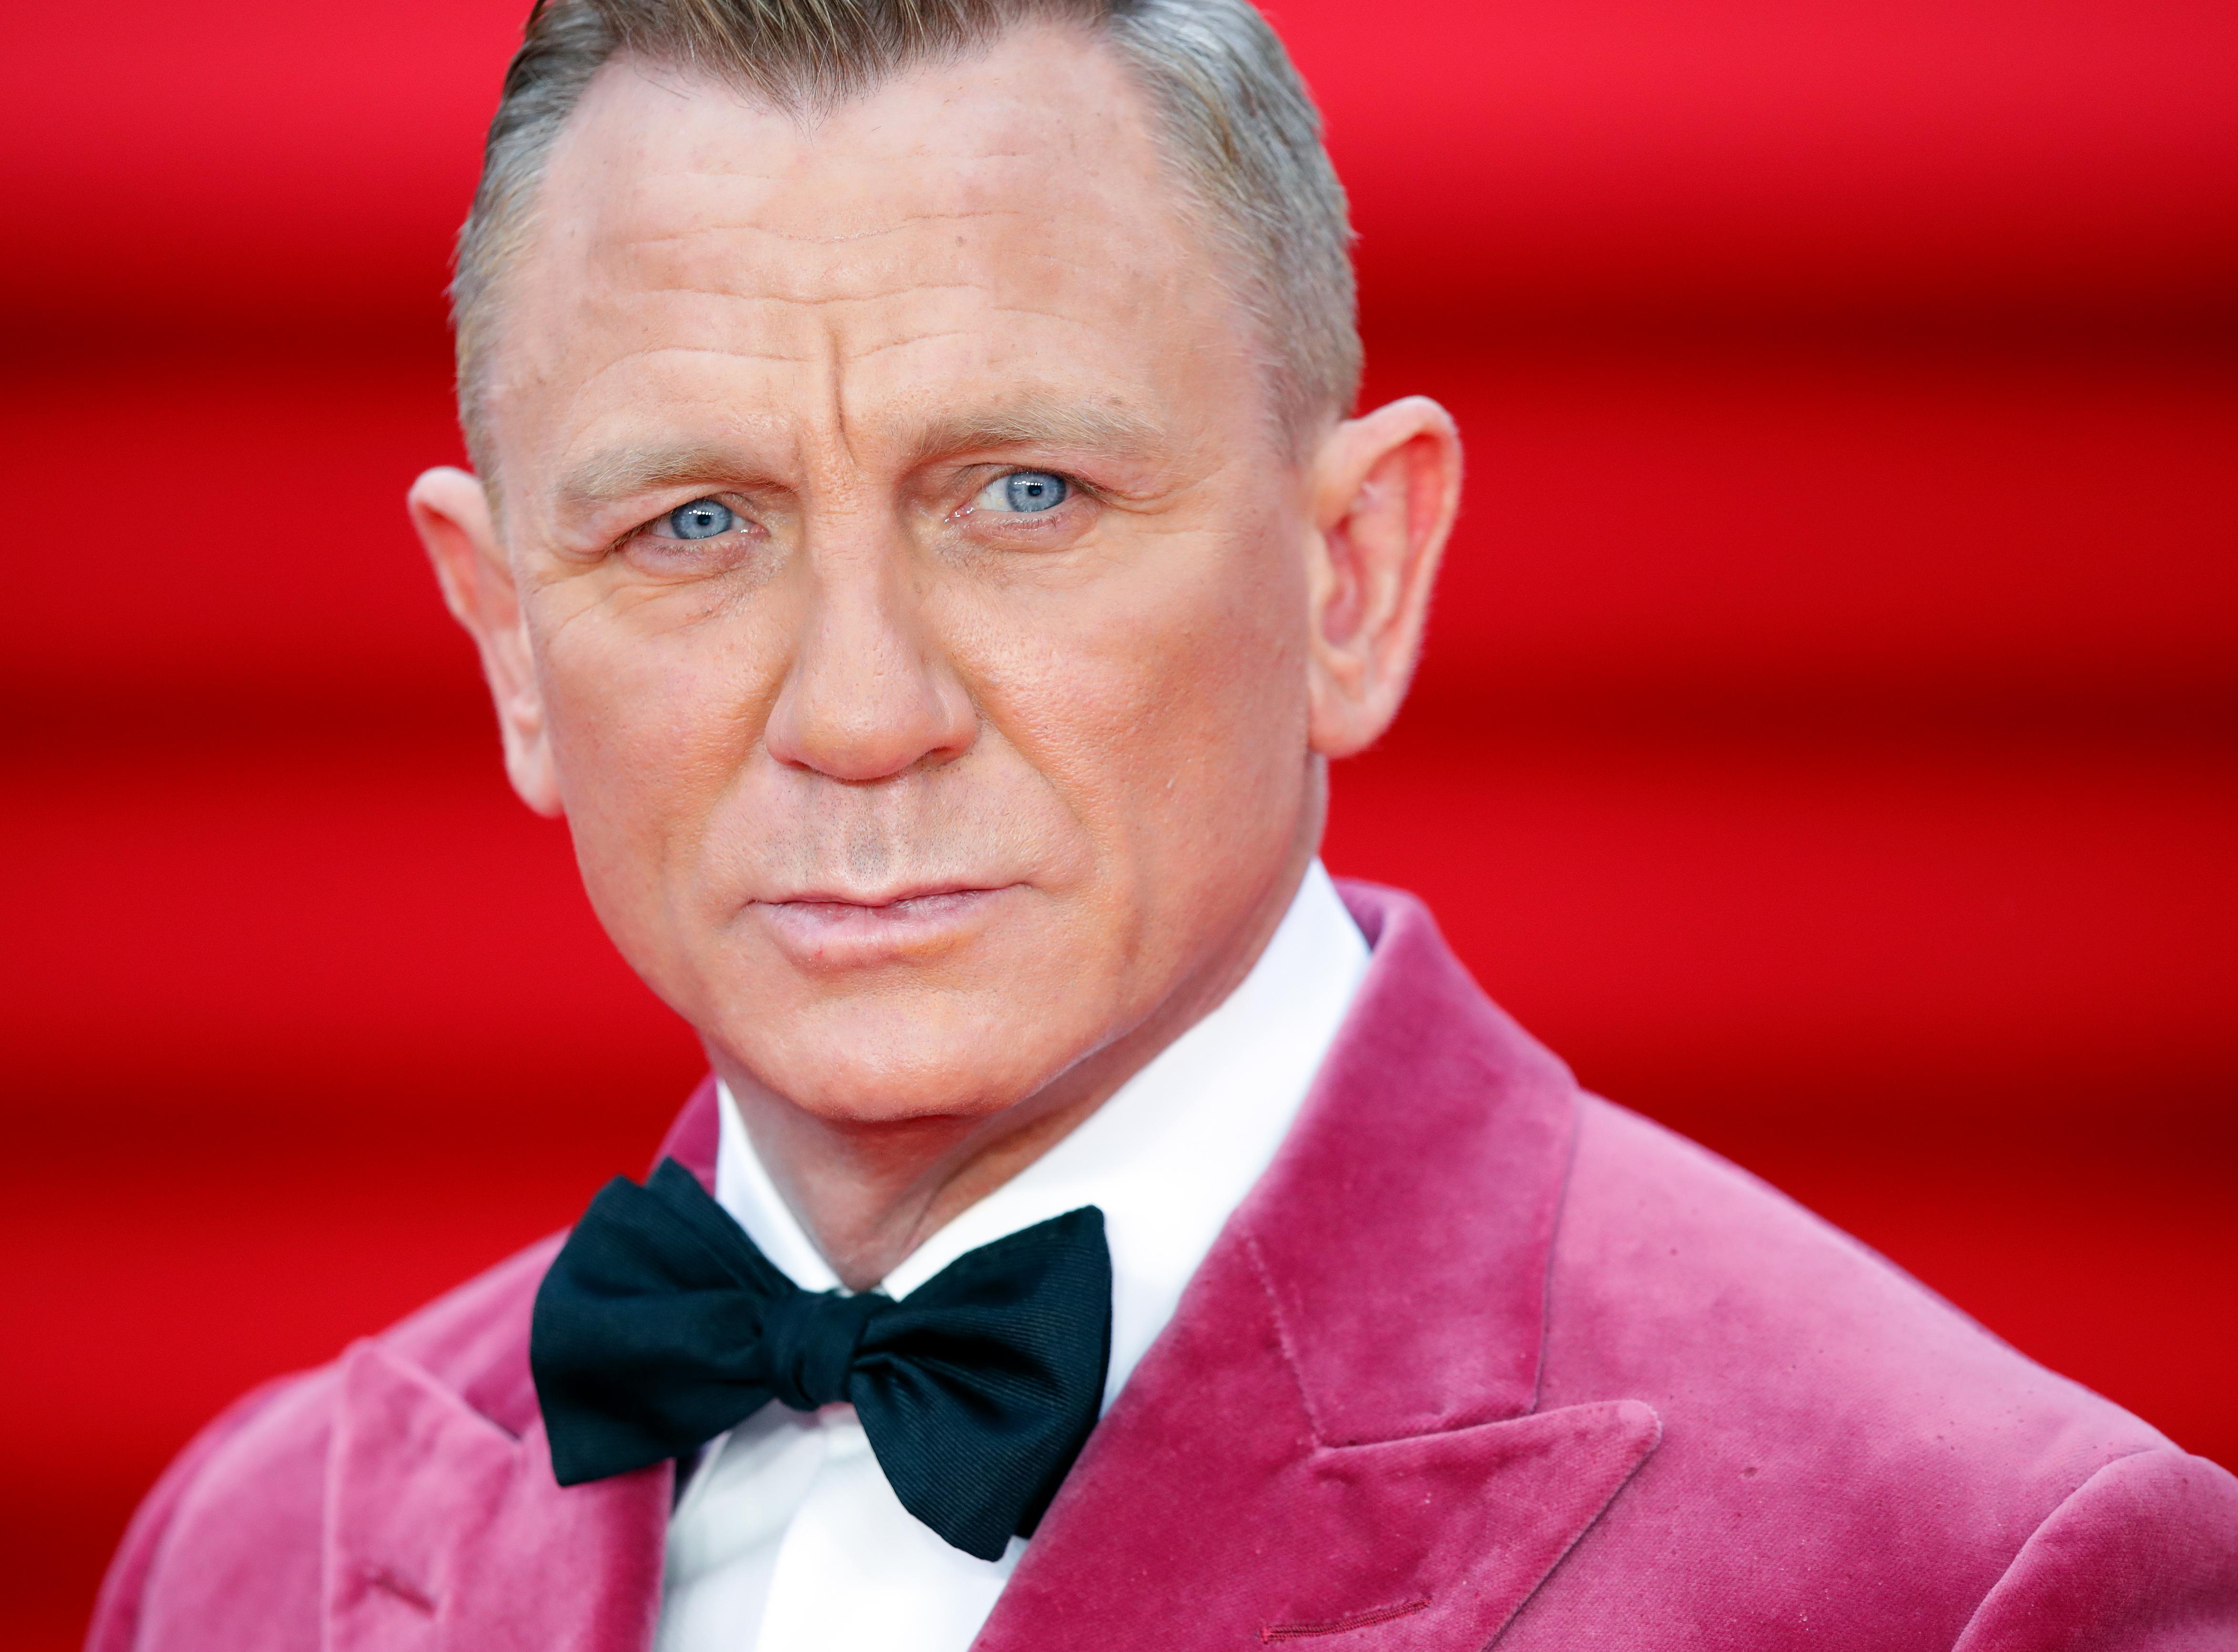 Daniel Craig's advice to the next James Bond: 'Don't be s***'